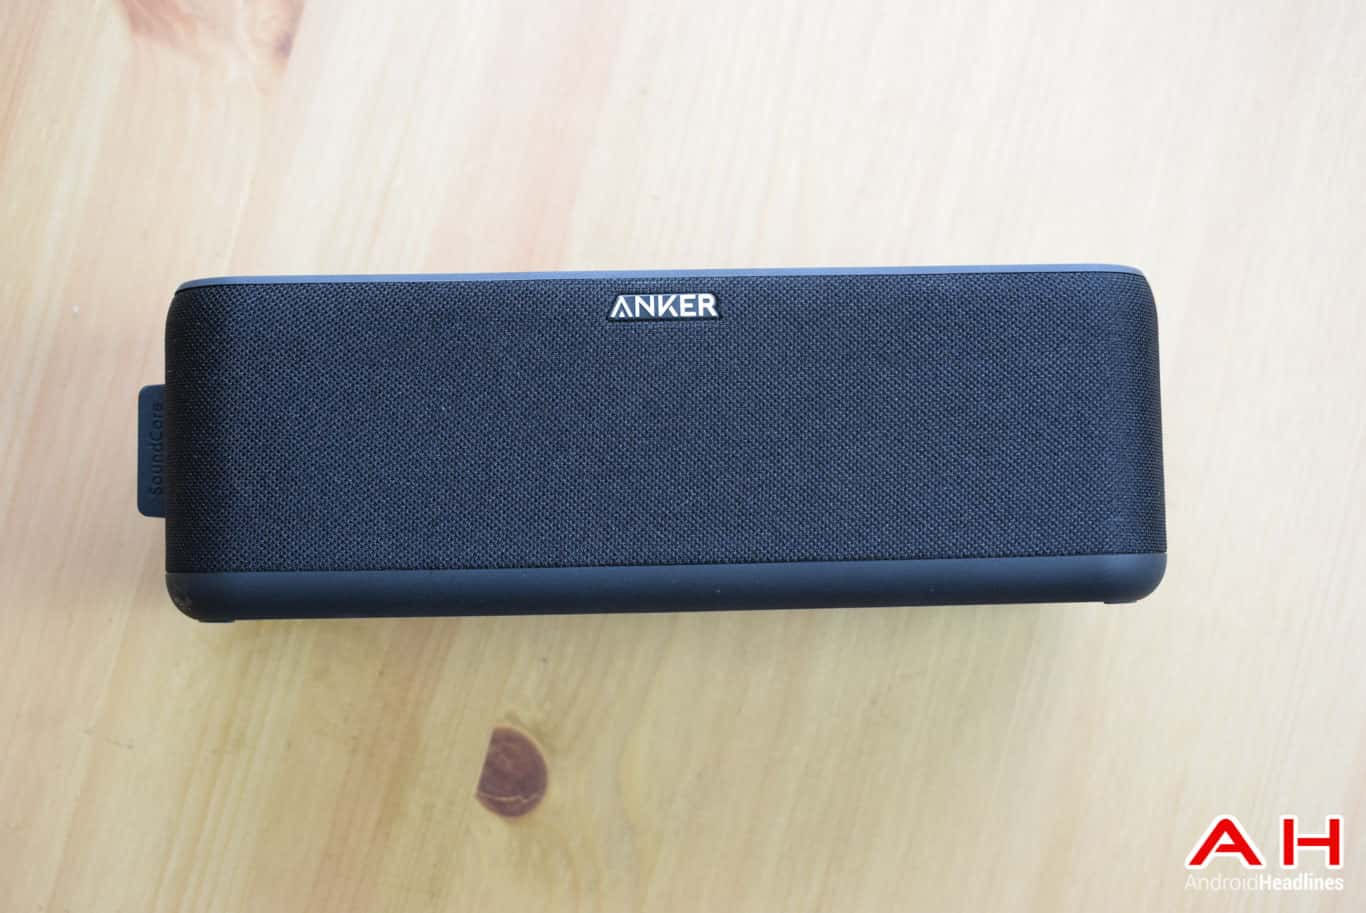 Anker SoundCore Boost AM AH 3